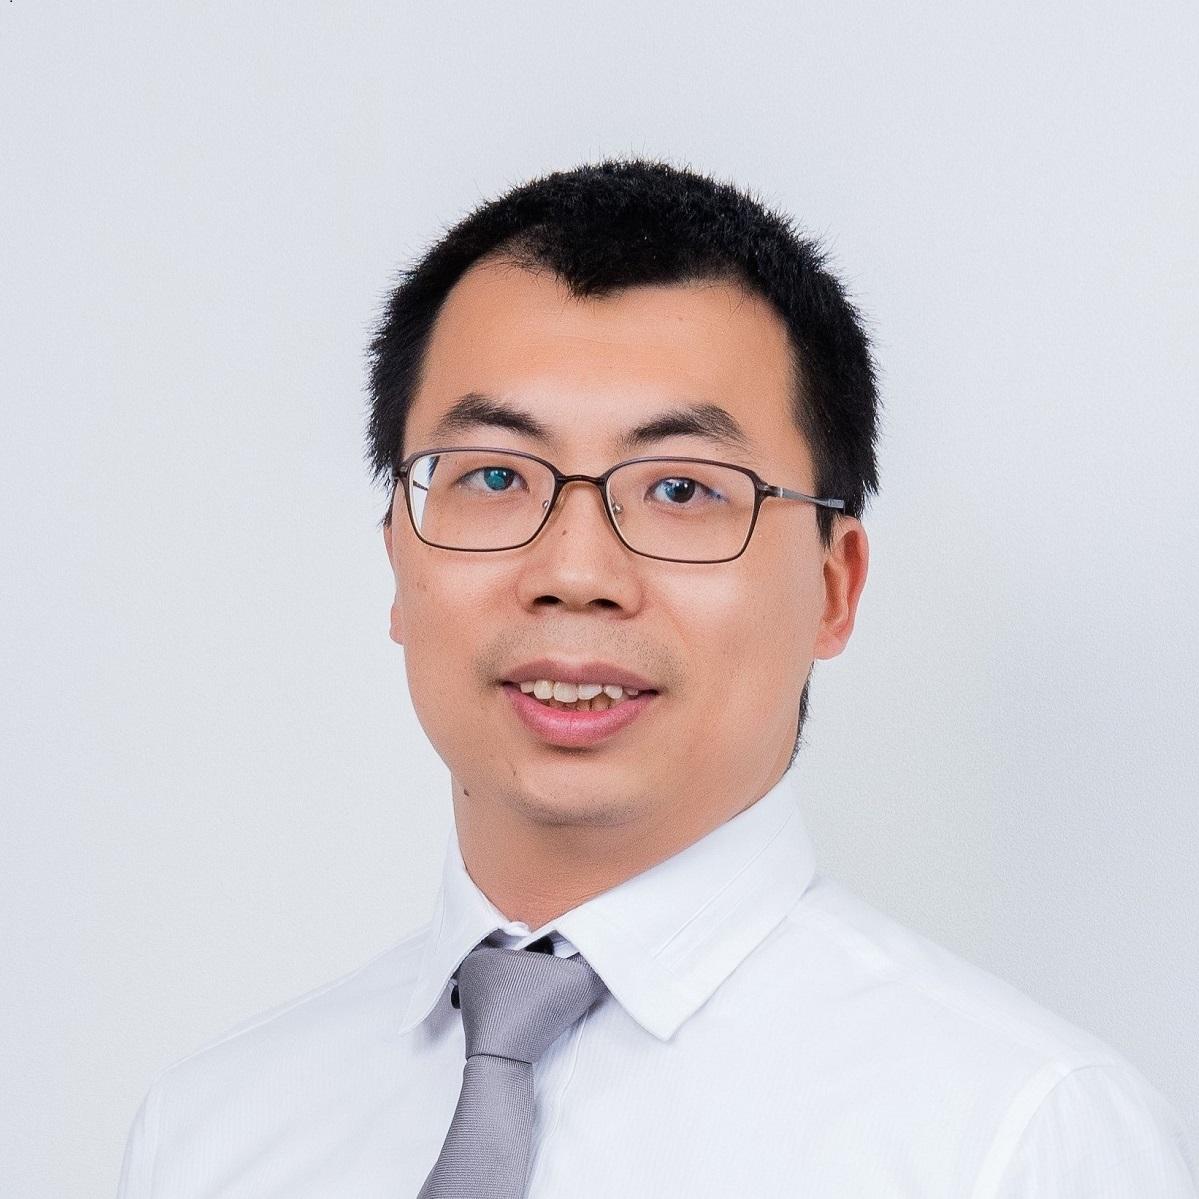 Mr. Zheng Bin